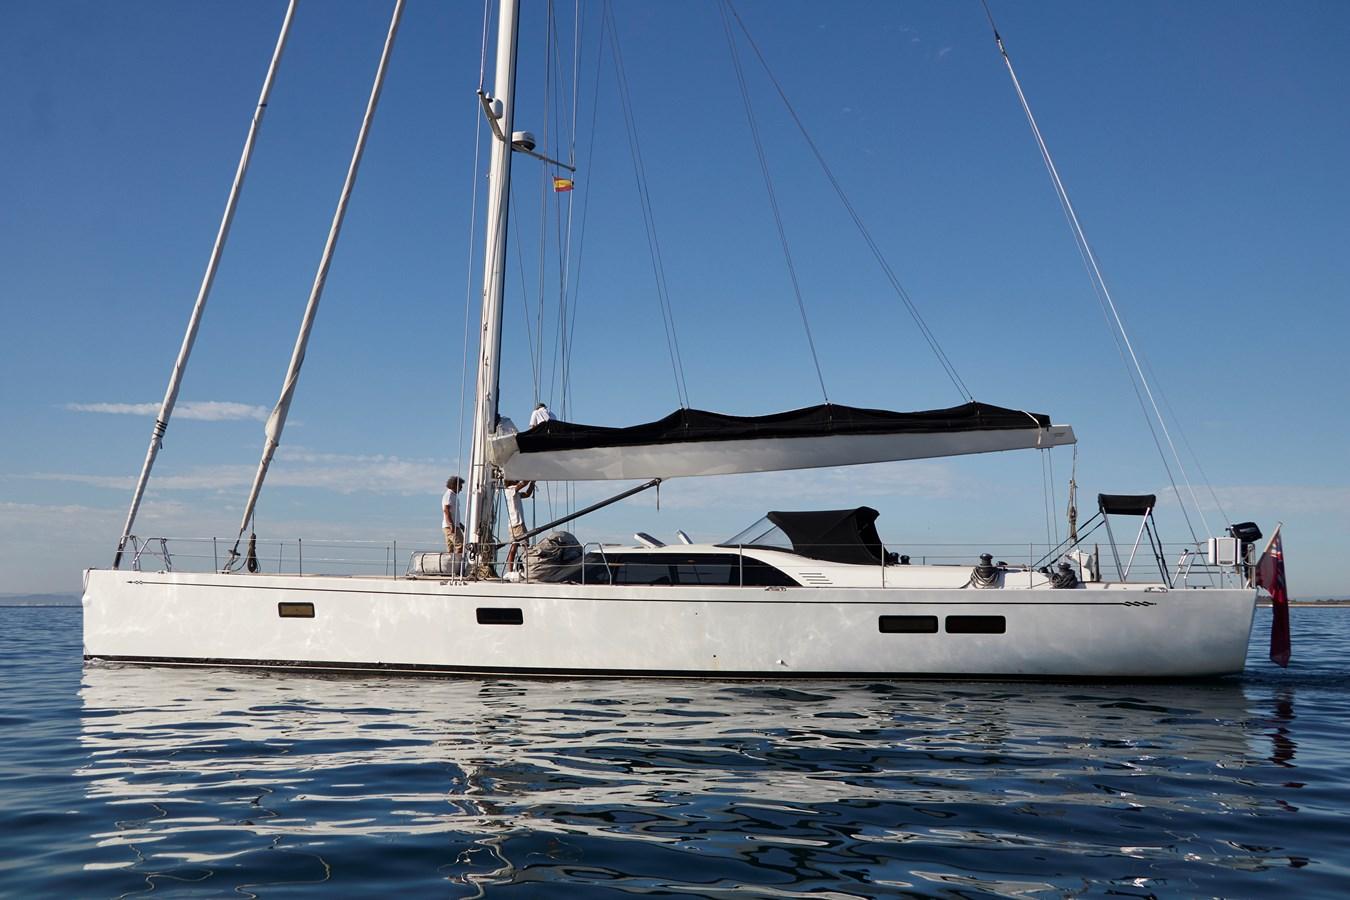 IMG_0011 2010 TRIPP Tripp 65 Cruising Sailboat 2650930